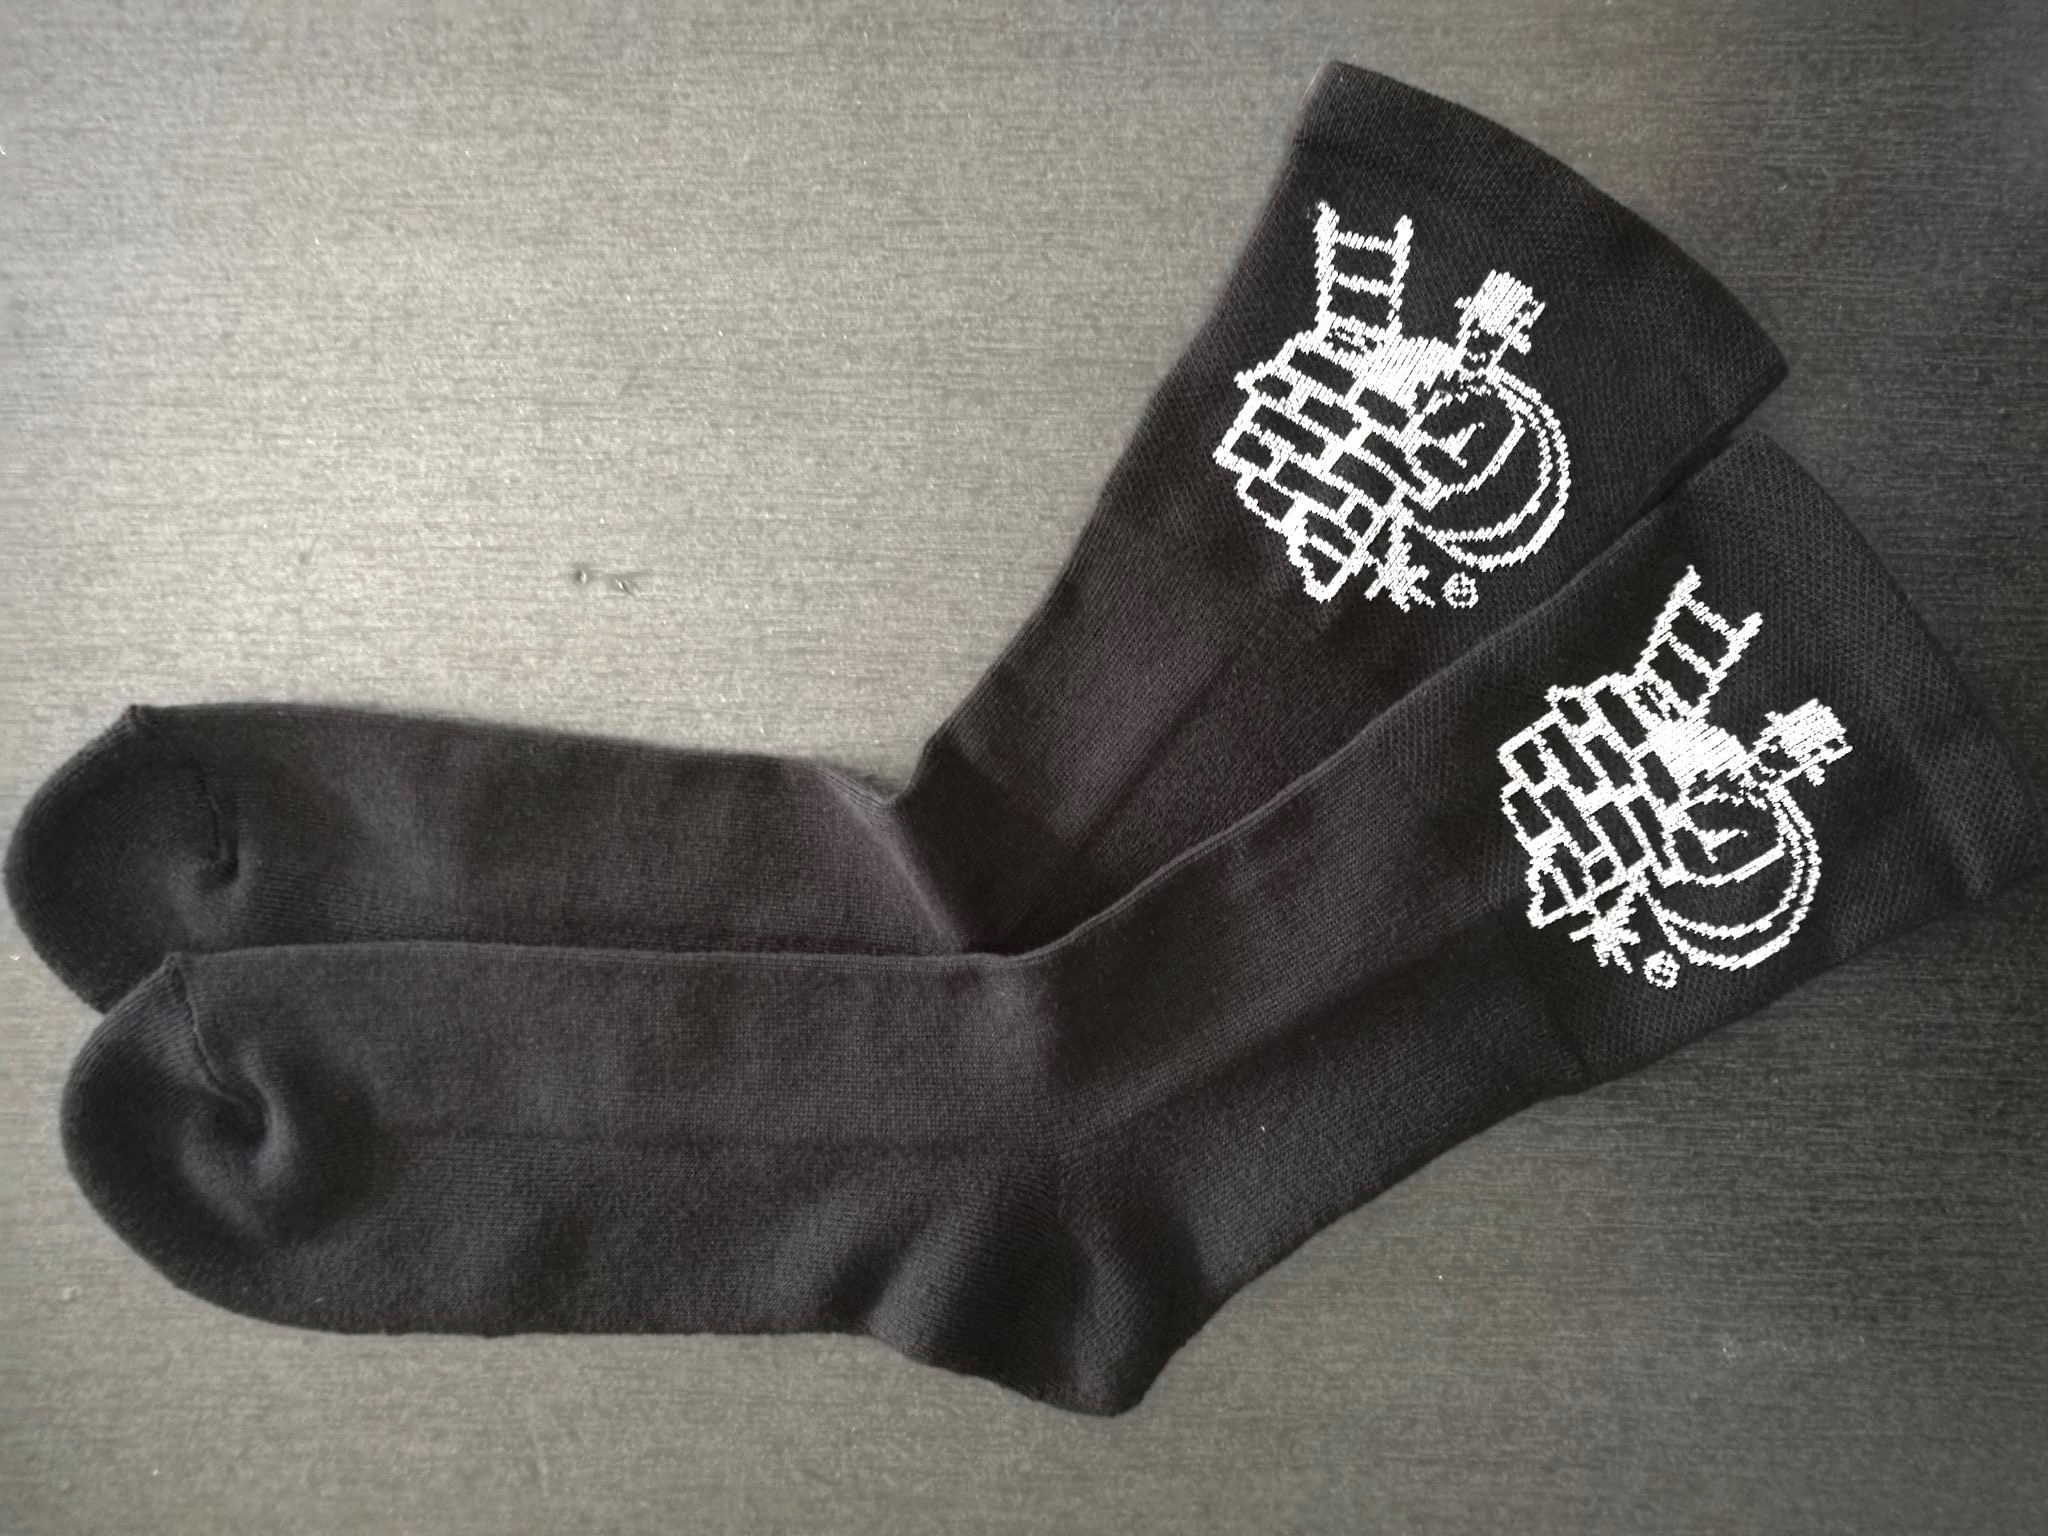 'Sooty Clobber' - Chimney Sweep Socks